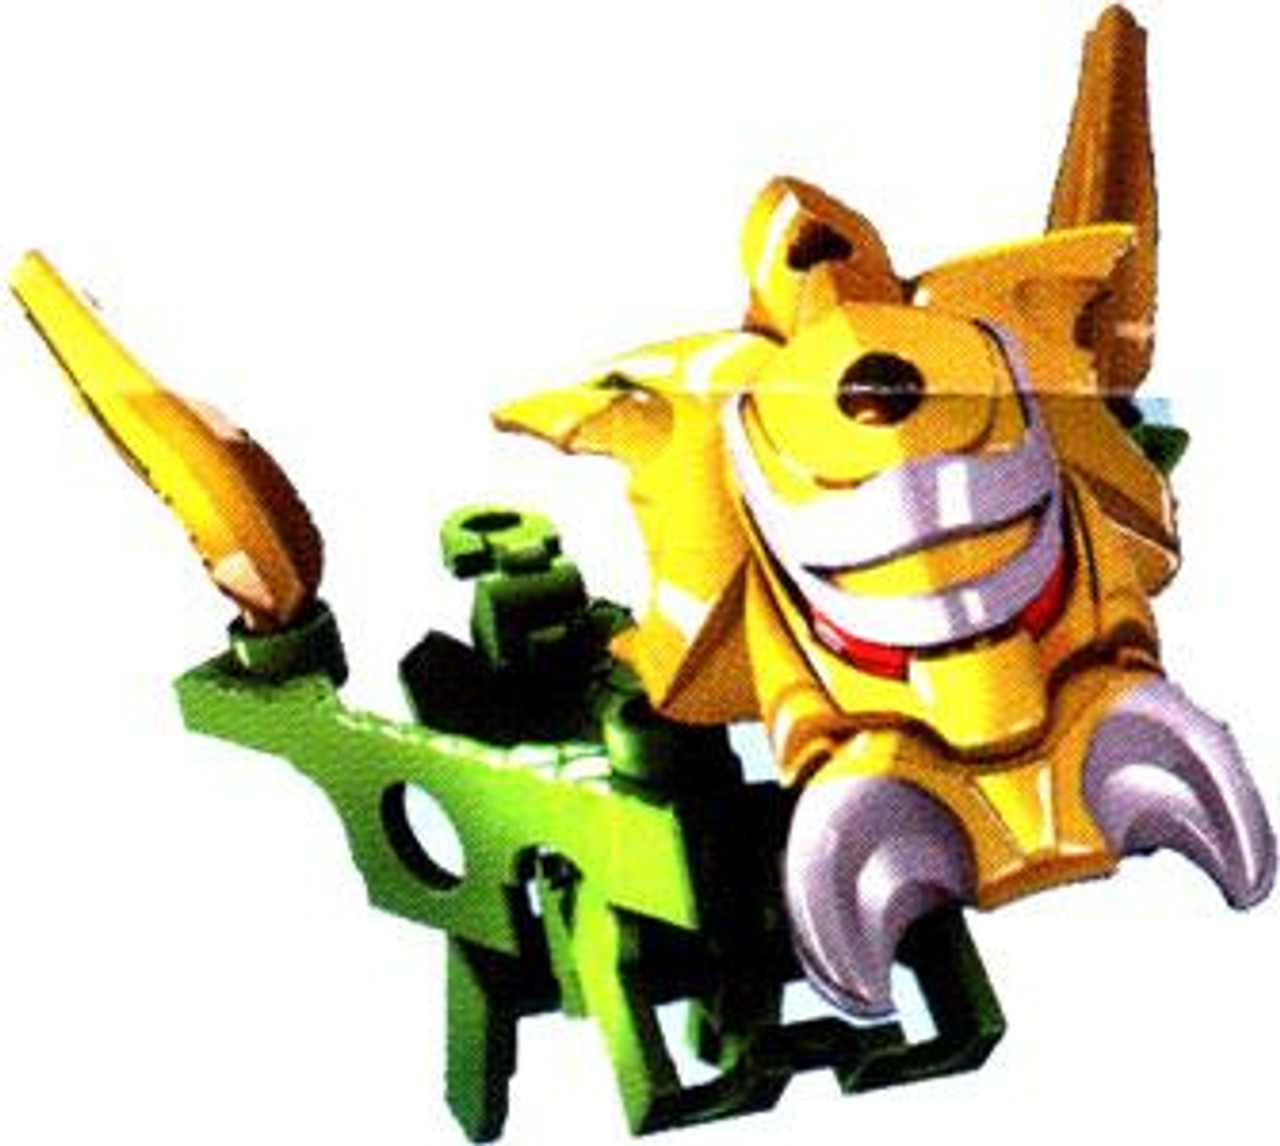 Tenkai Knights Loose Tenkai Aerax Minifigure [Loose]